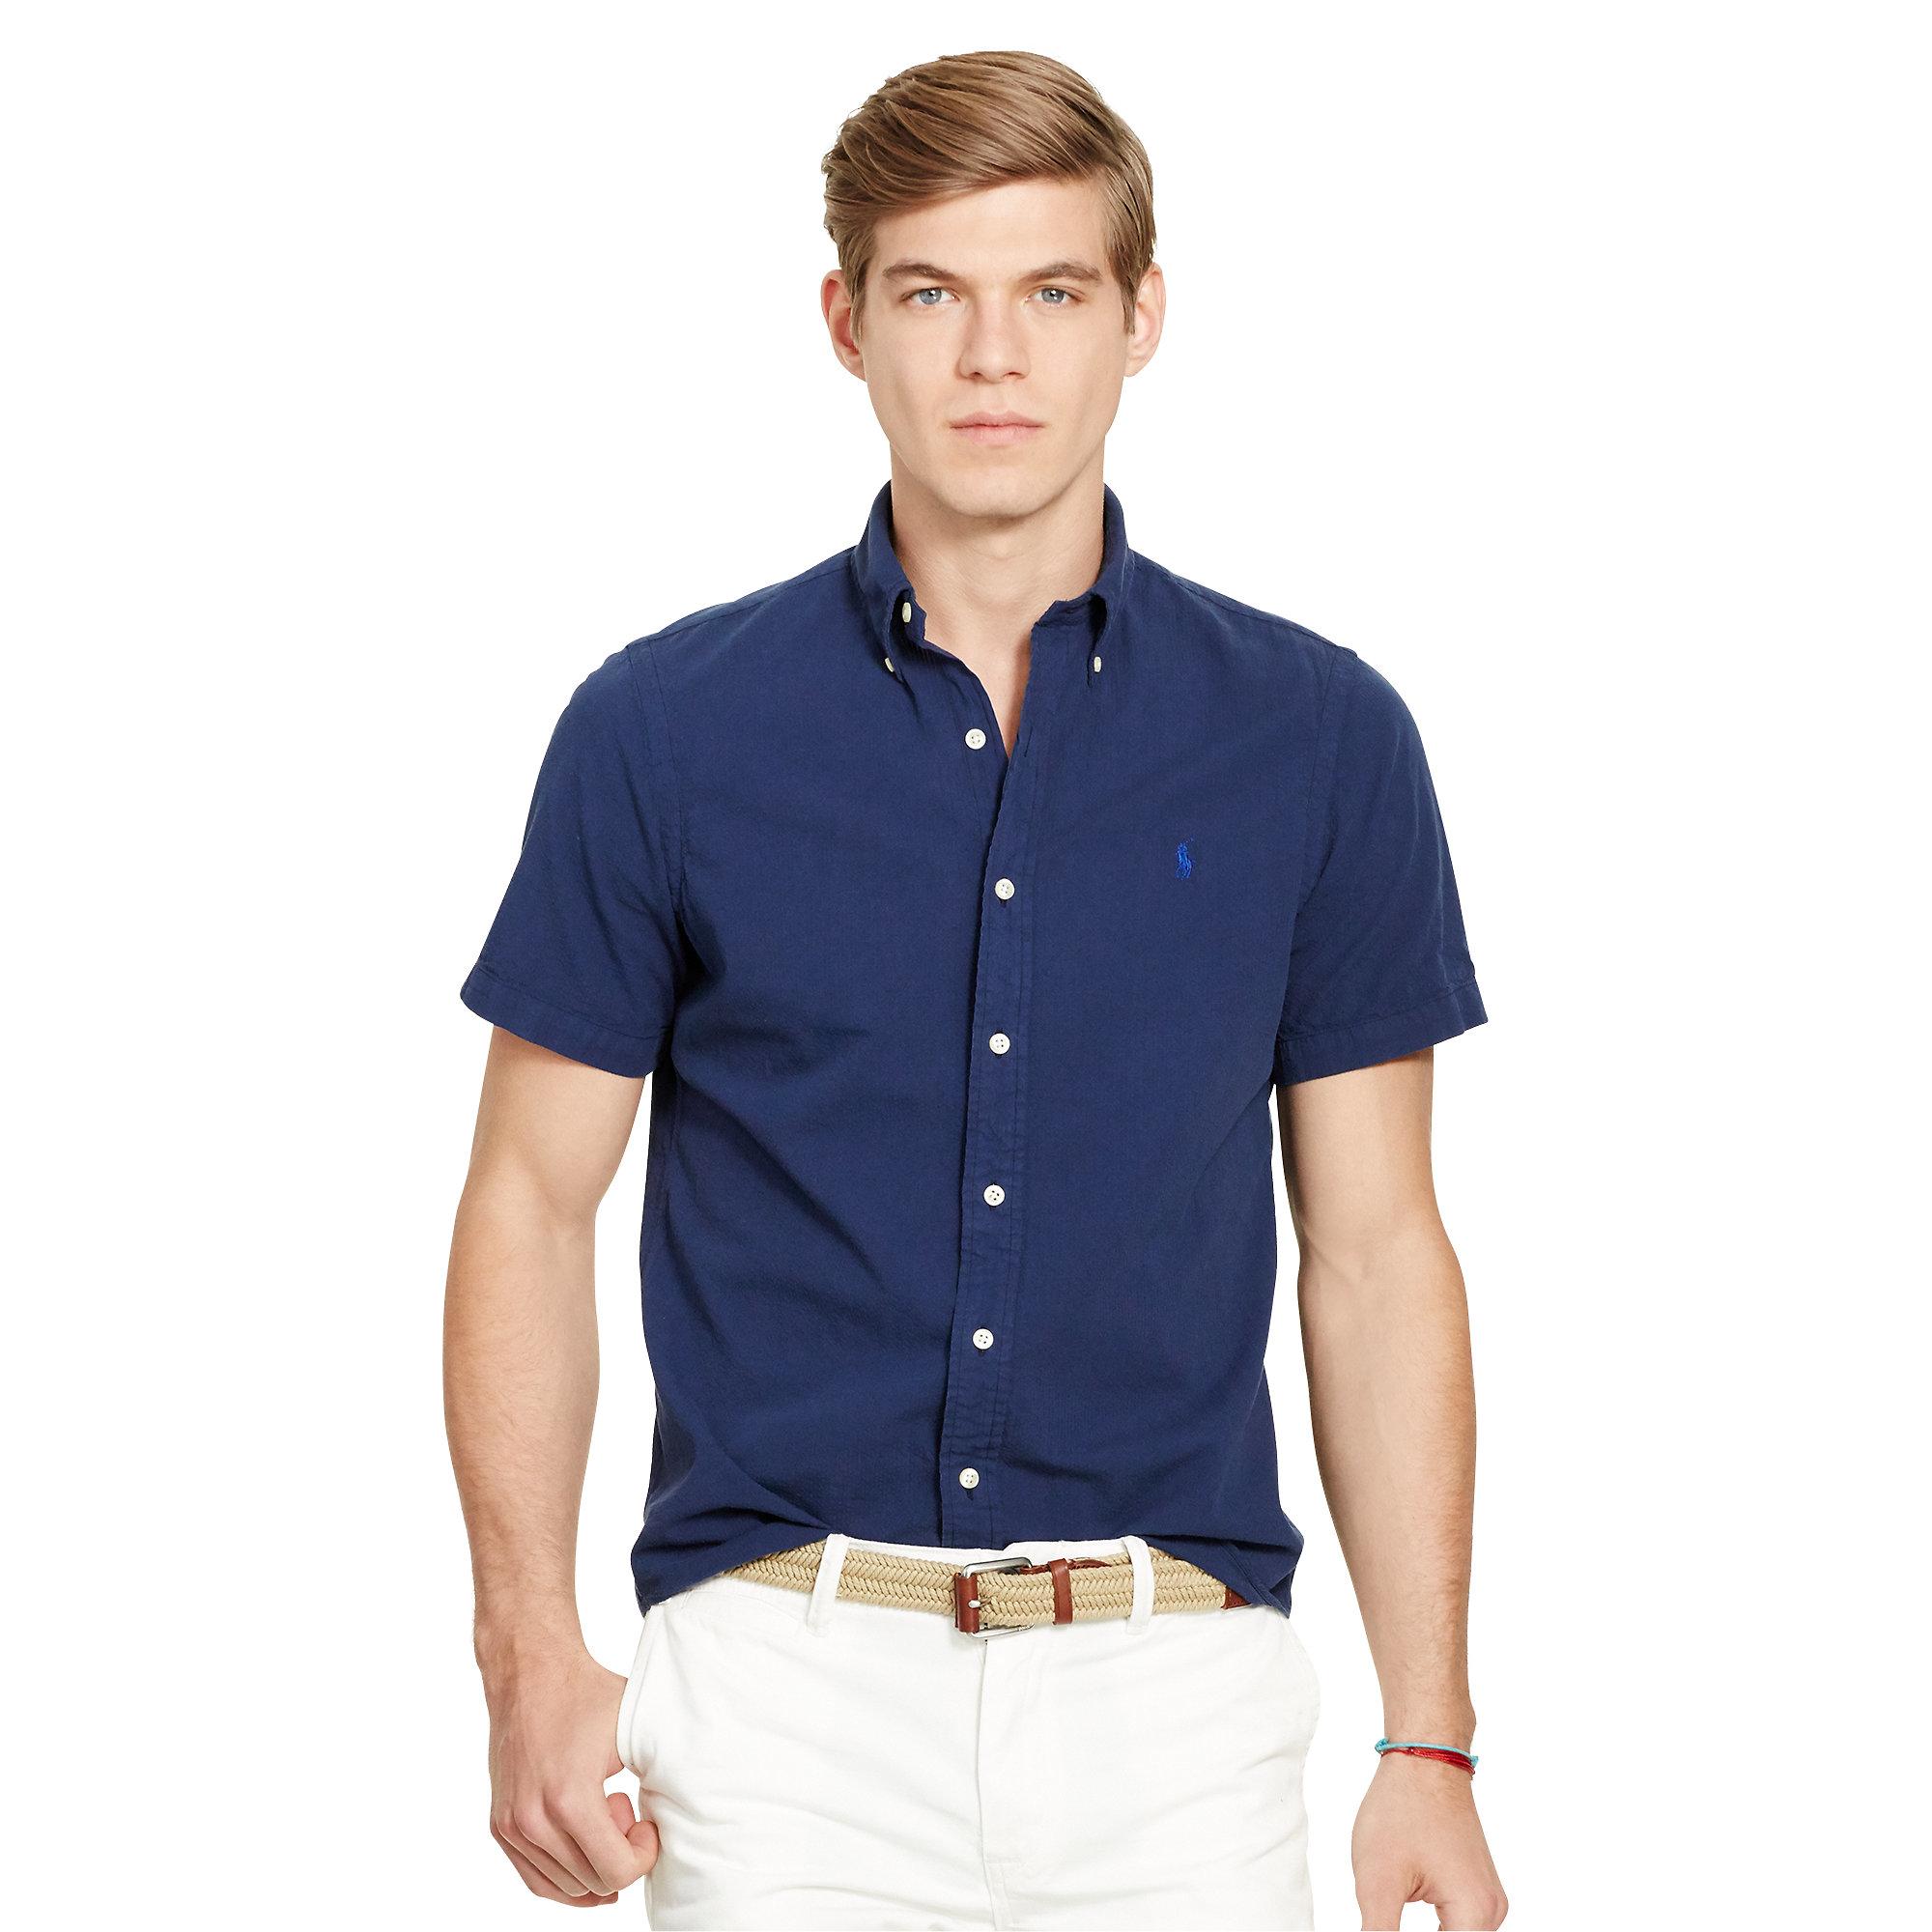 Polo Ralph Lauren Slim Cotton Seersucker Shirt In Blue For Men Lyst